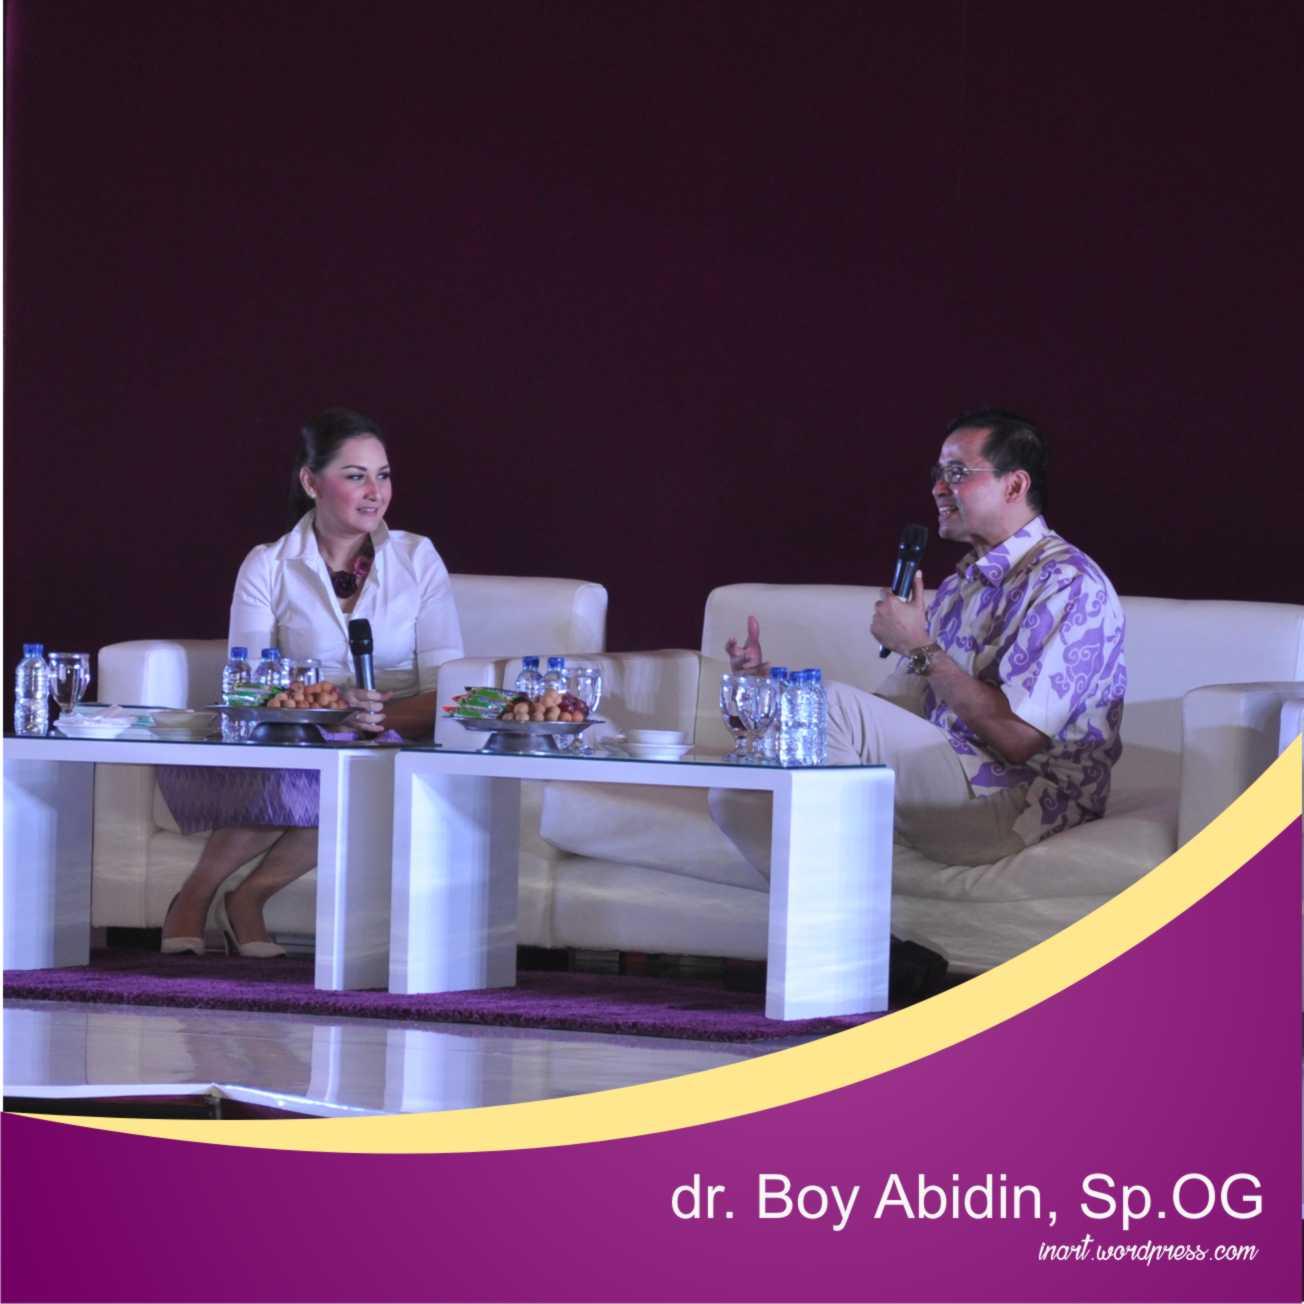 dr Boy Abidin